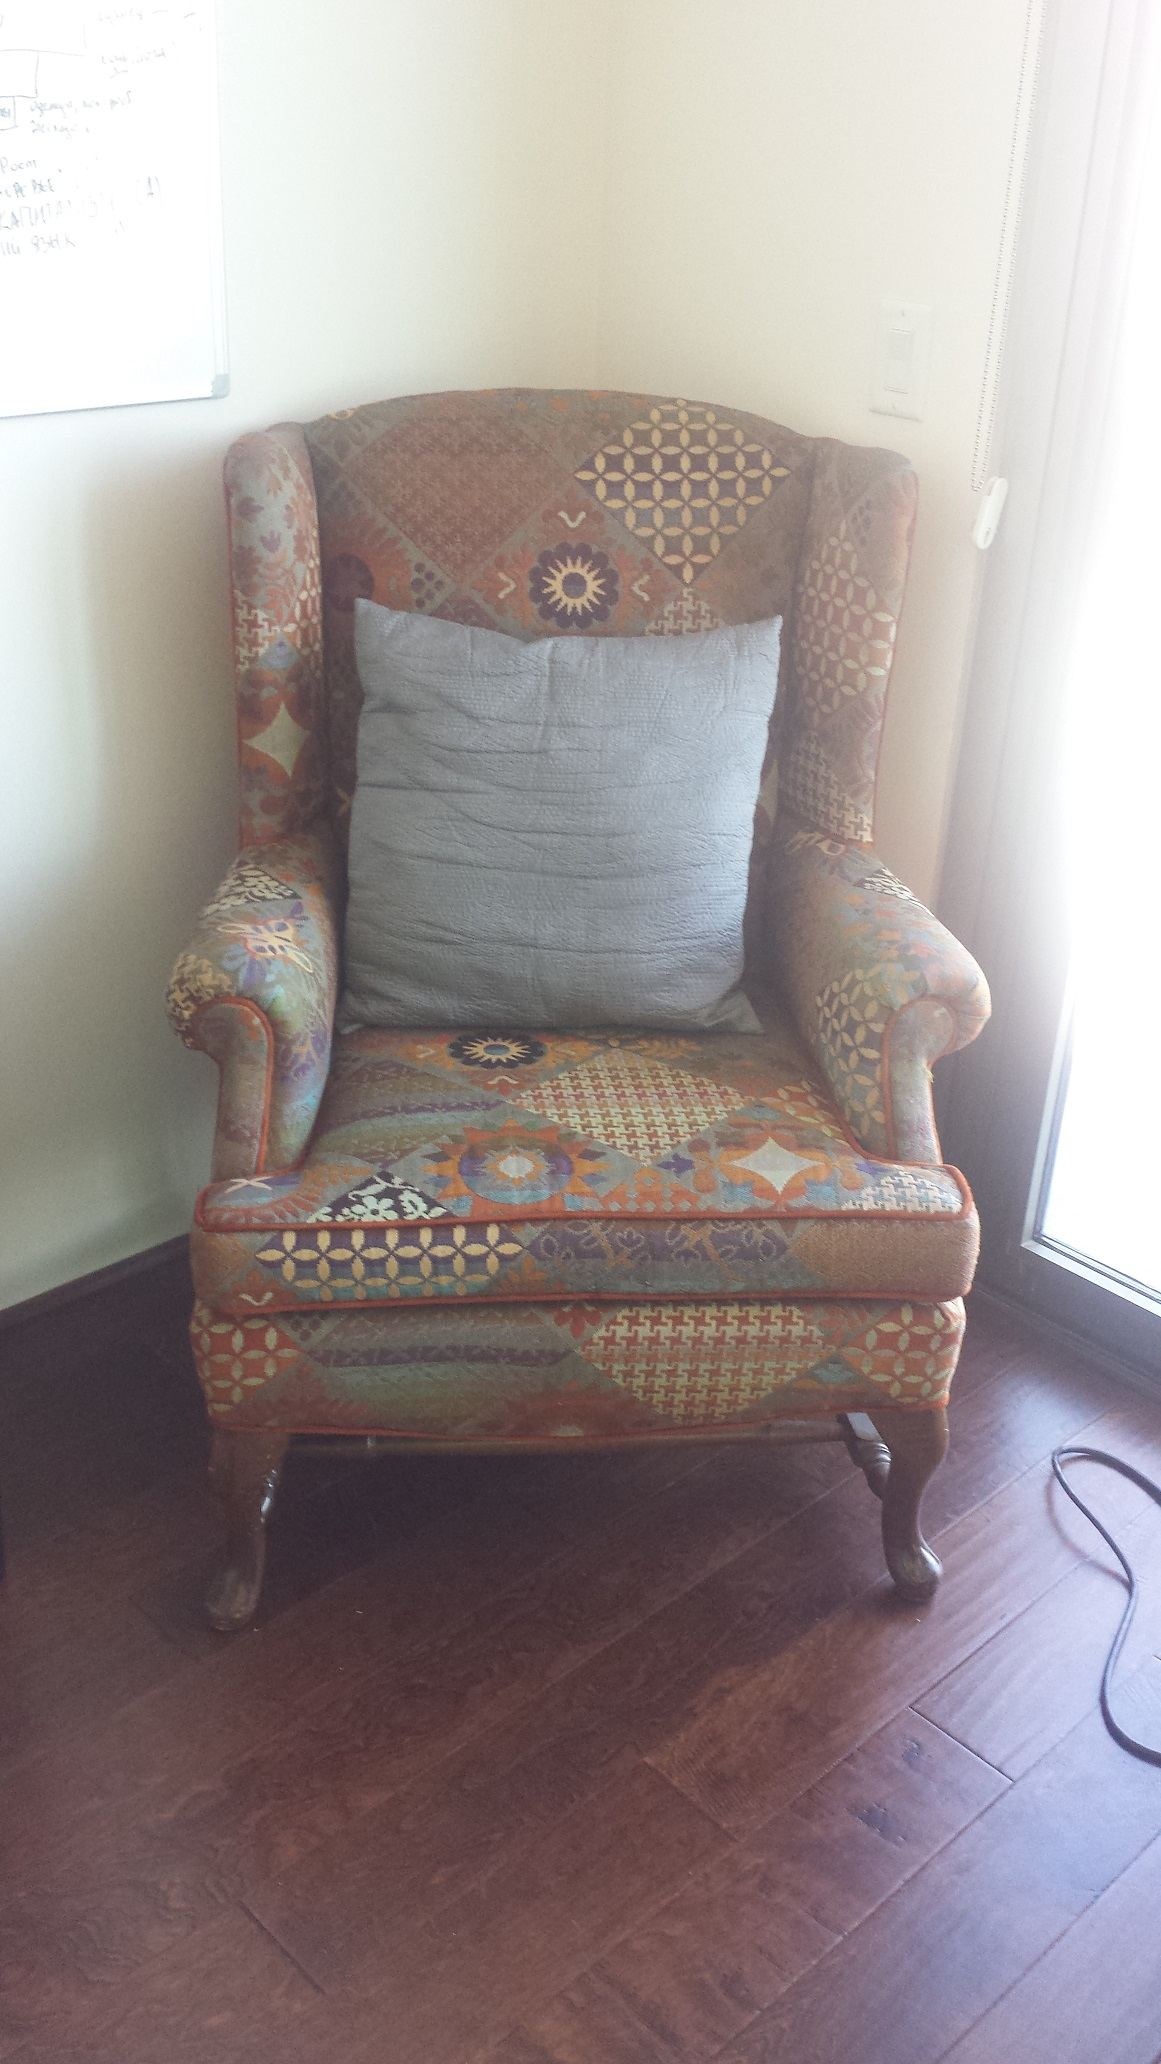 Furniture for sale 2BR apt downtown Las Vegas